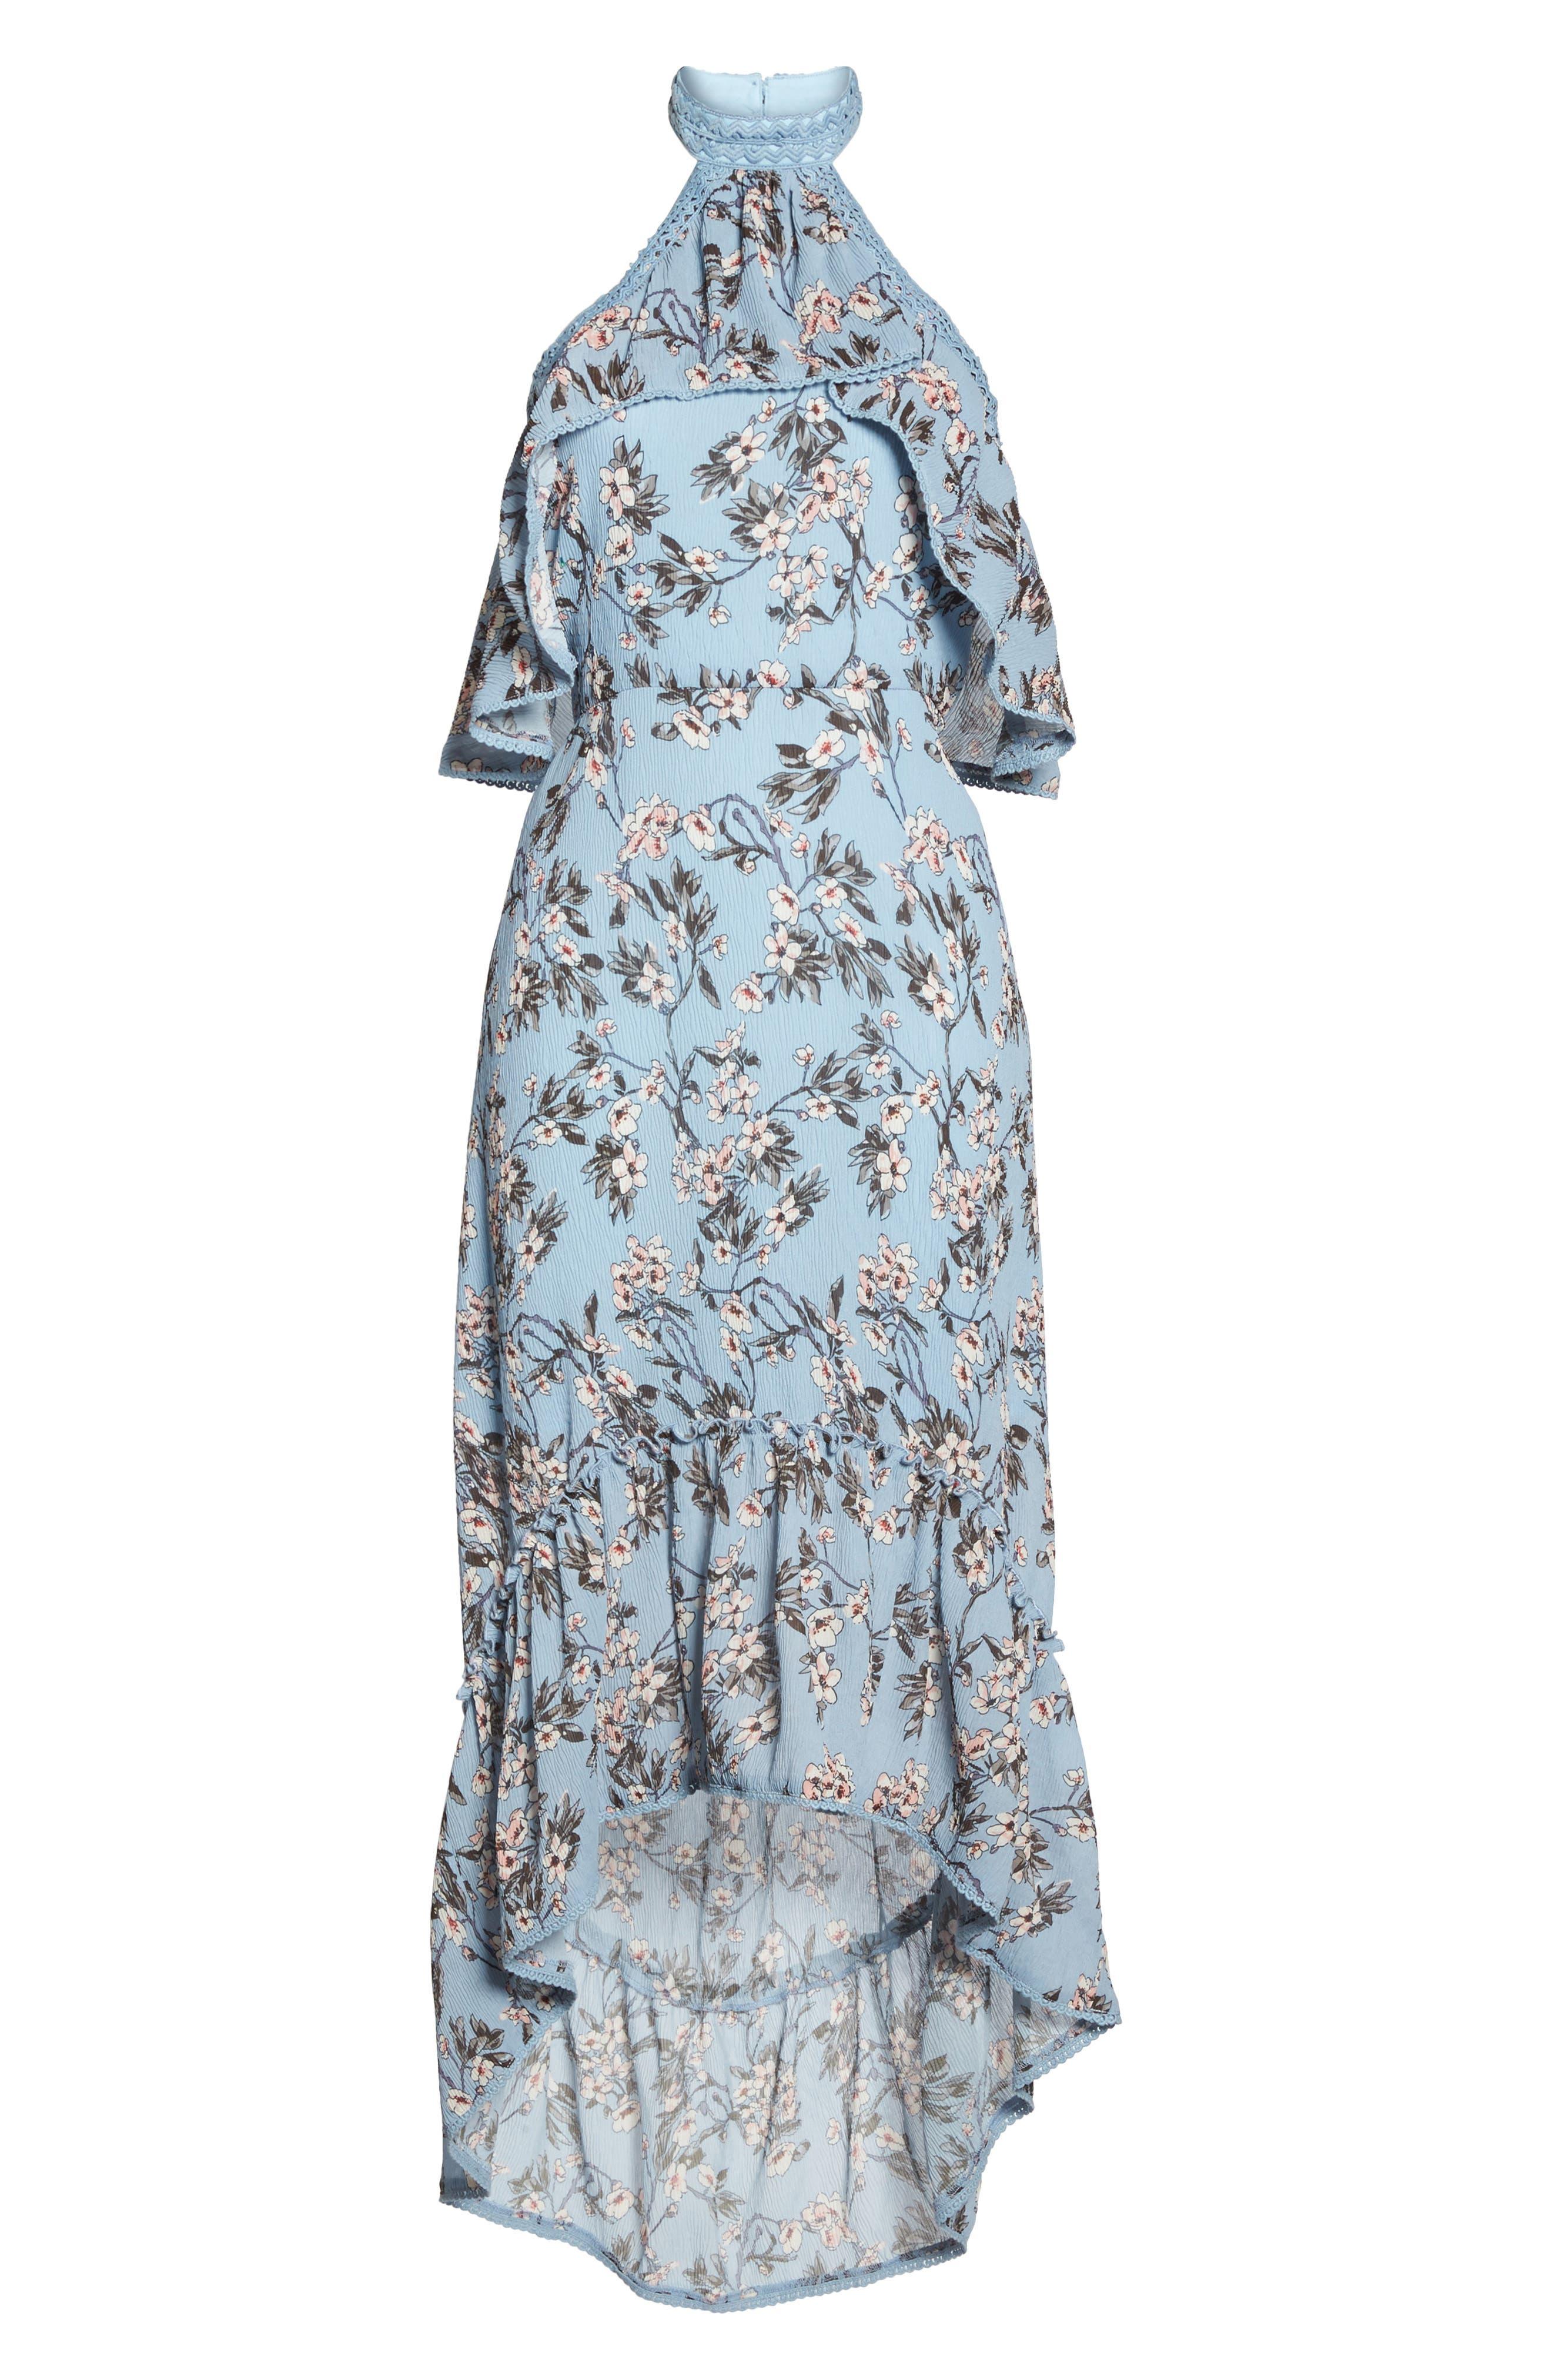 Floral Print High/Low Halter Dress,                             Alternate thumbnail 6, color,                             Blue Madison Floral